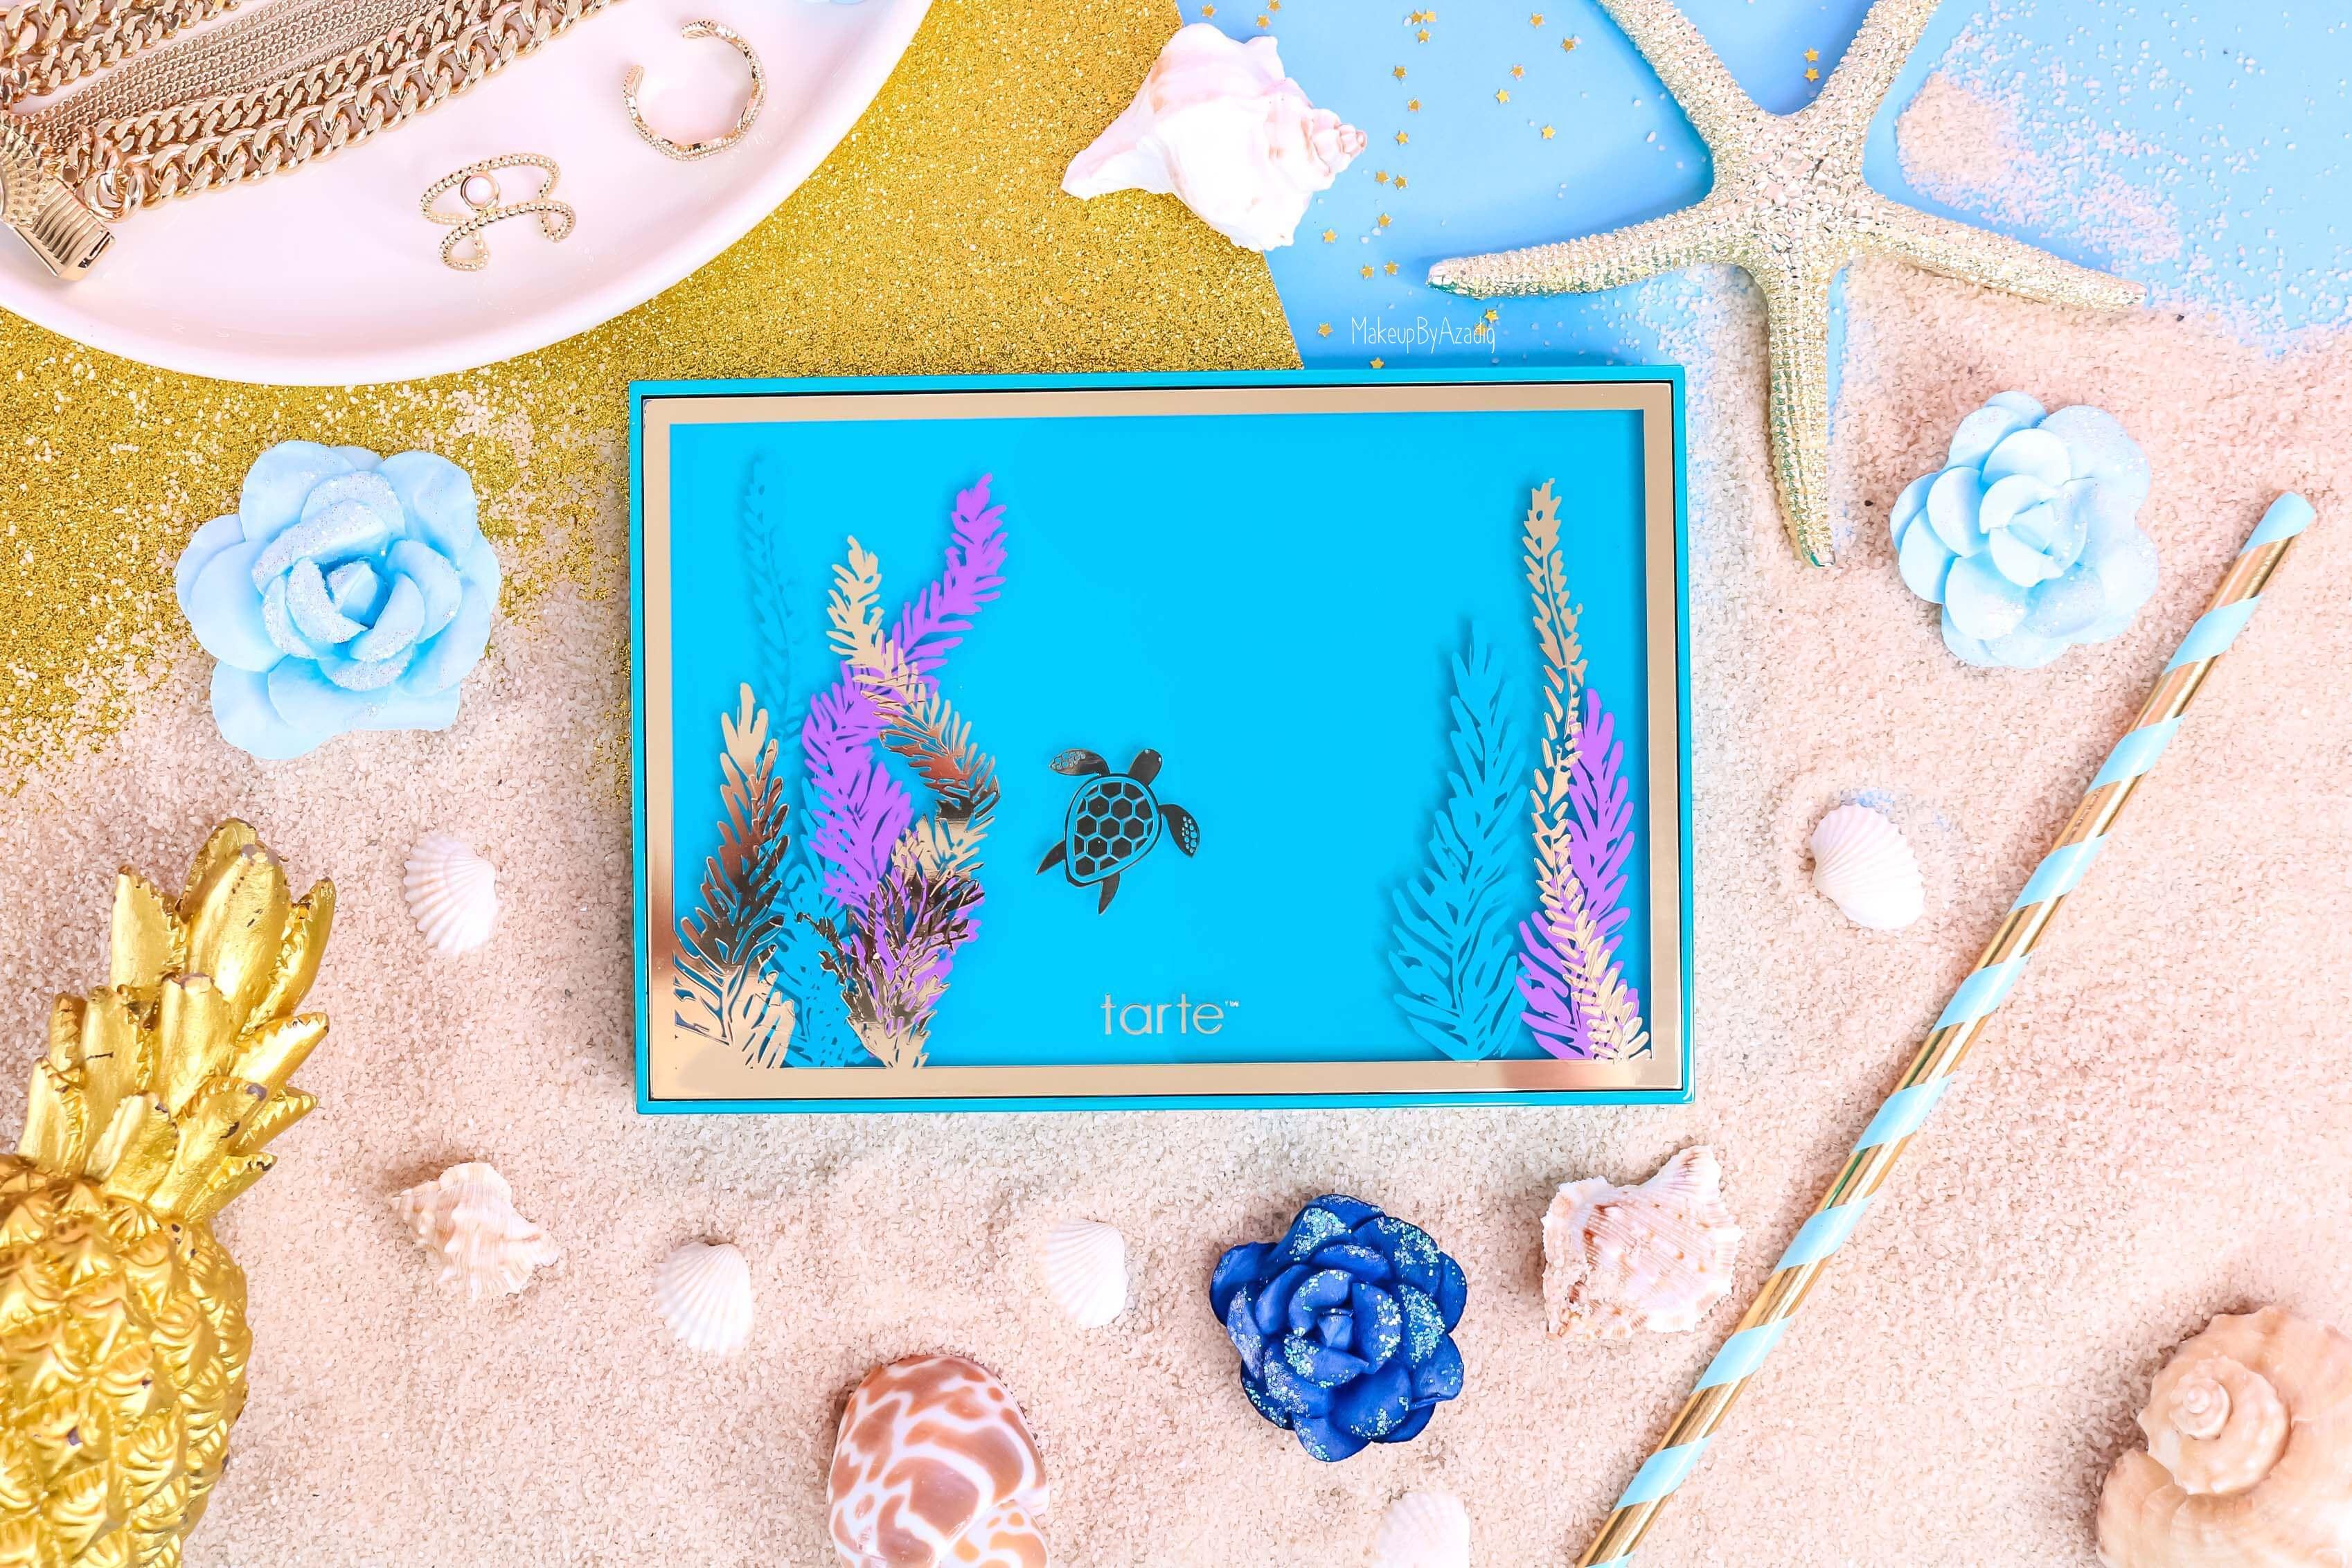 revue-palette-tarte-cosmetics-france-sephora-makeupbyazadig-swatch-prix-avis-rainforest-of-the-sea-packaging